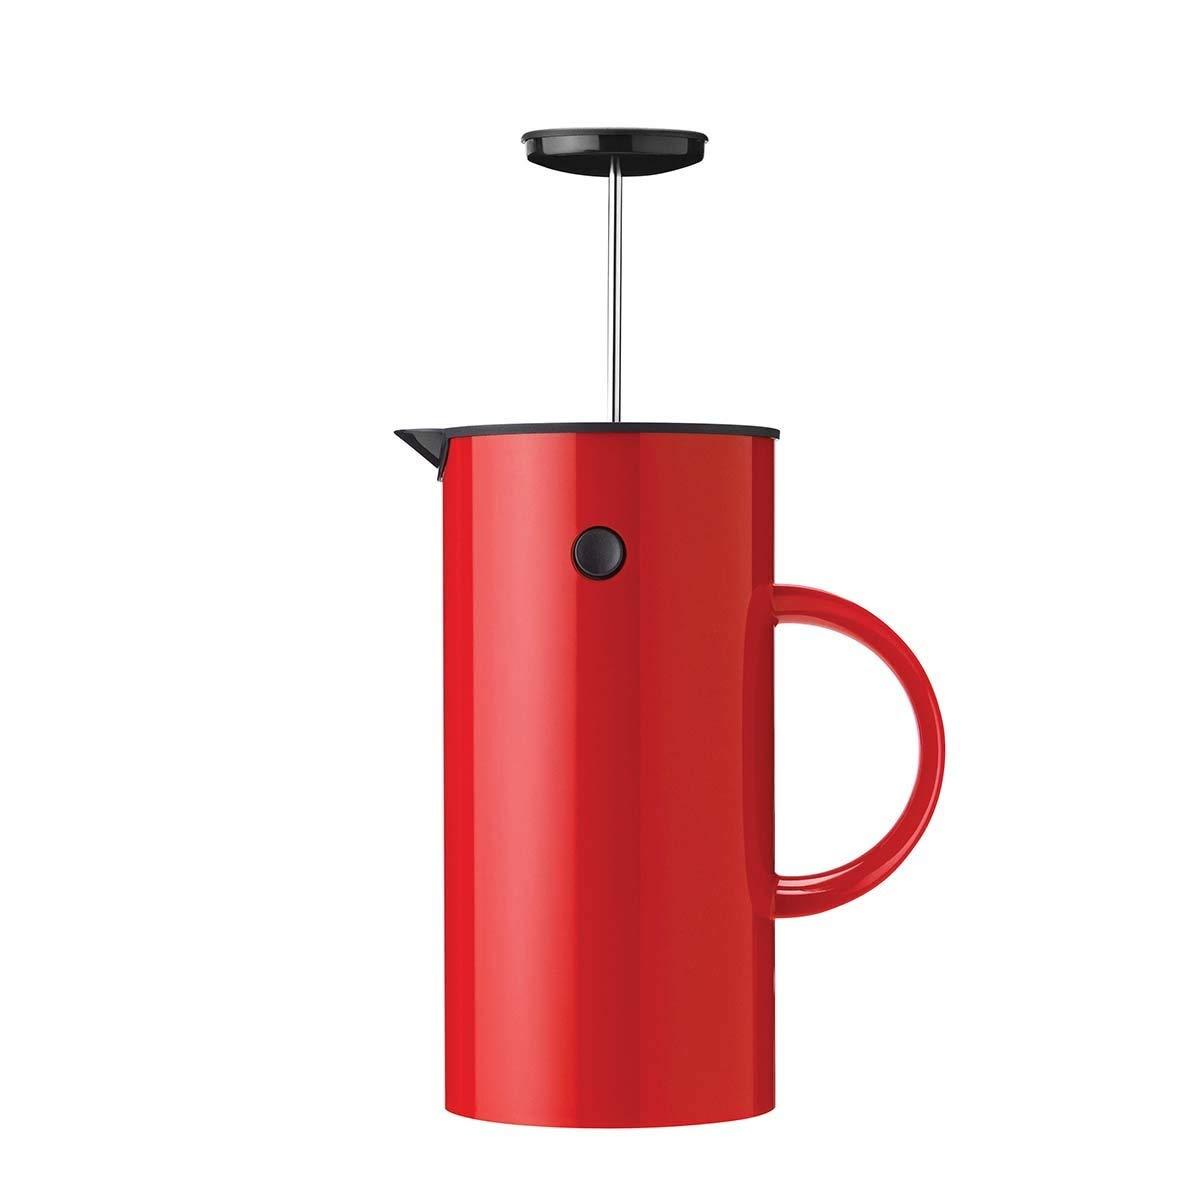 Stelton 813 EM pressf Filtro Tetera (1 L, plástico, Rojo, 14 x 14 ...